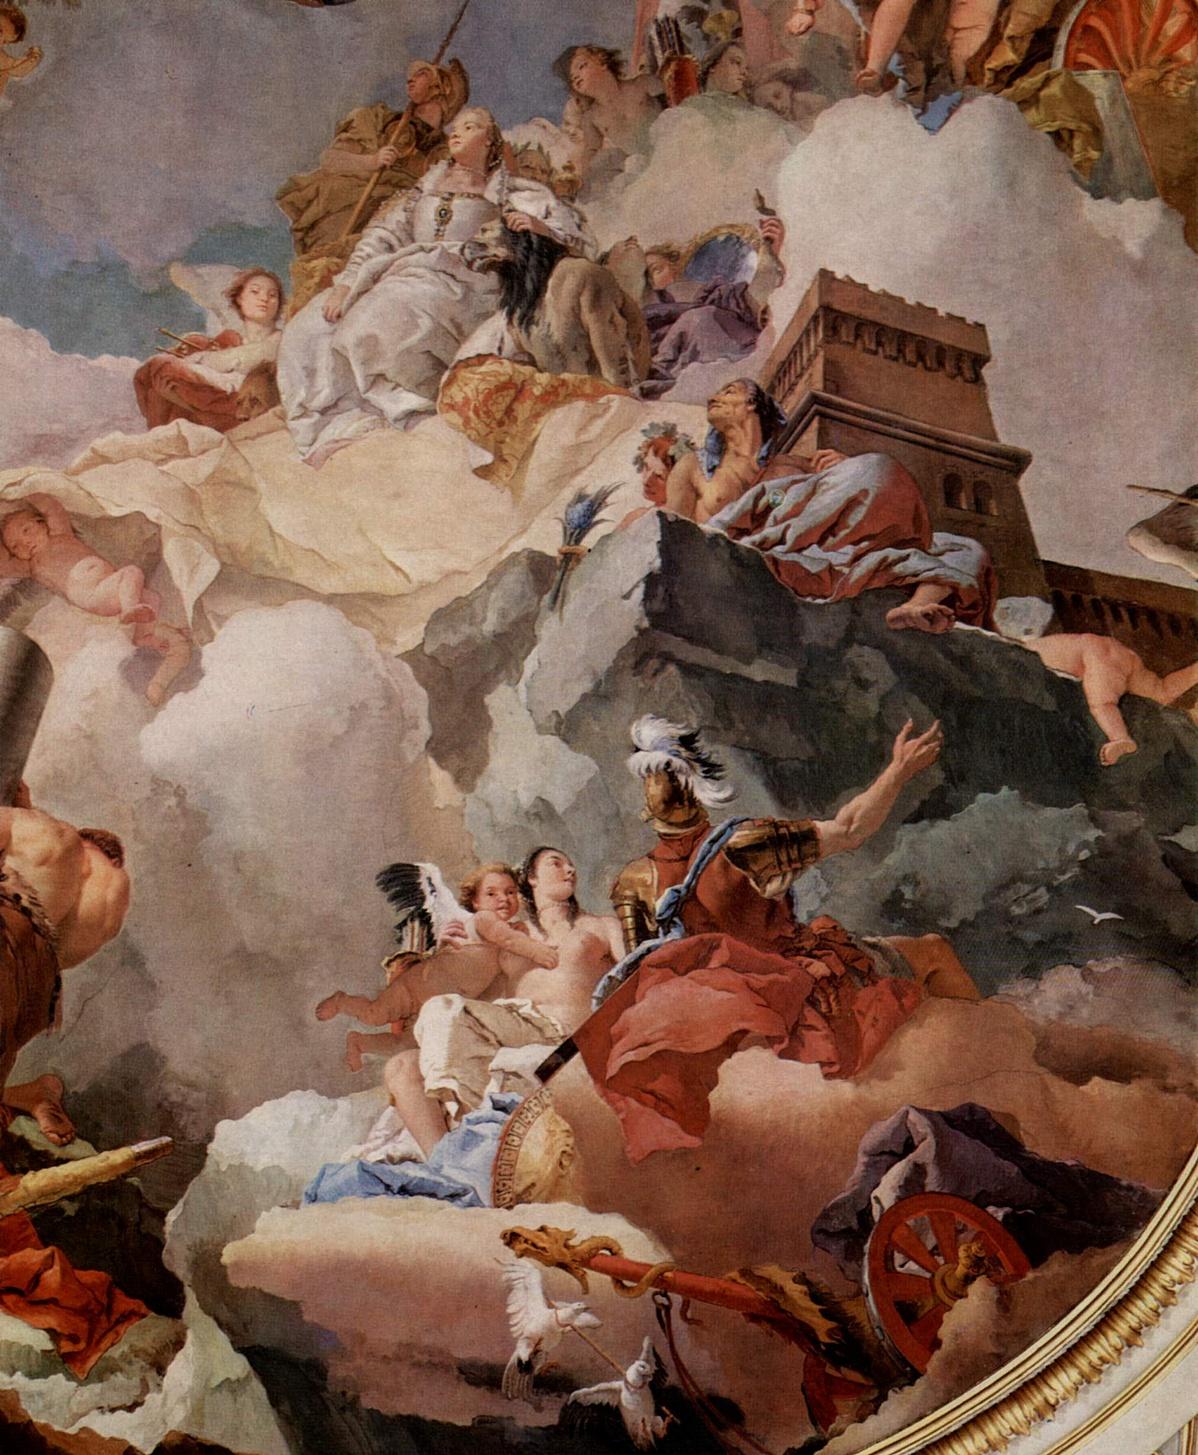 Giovanni_Battista_Tiepolo_034-163329.jpg